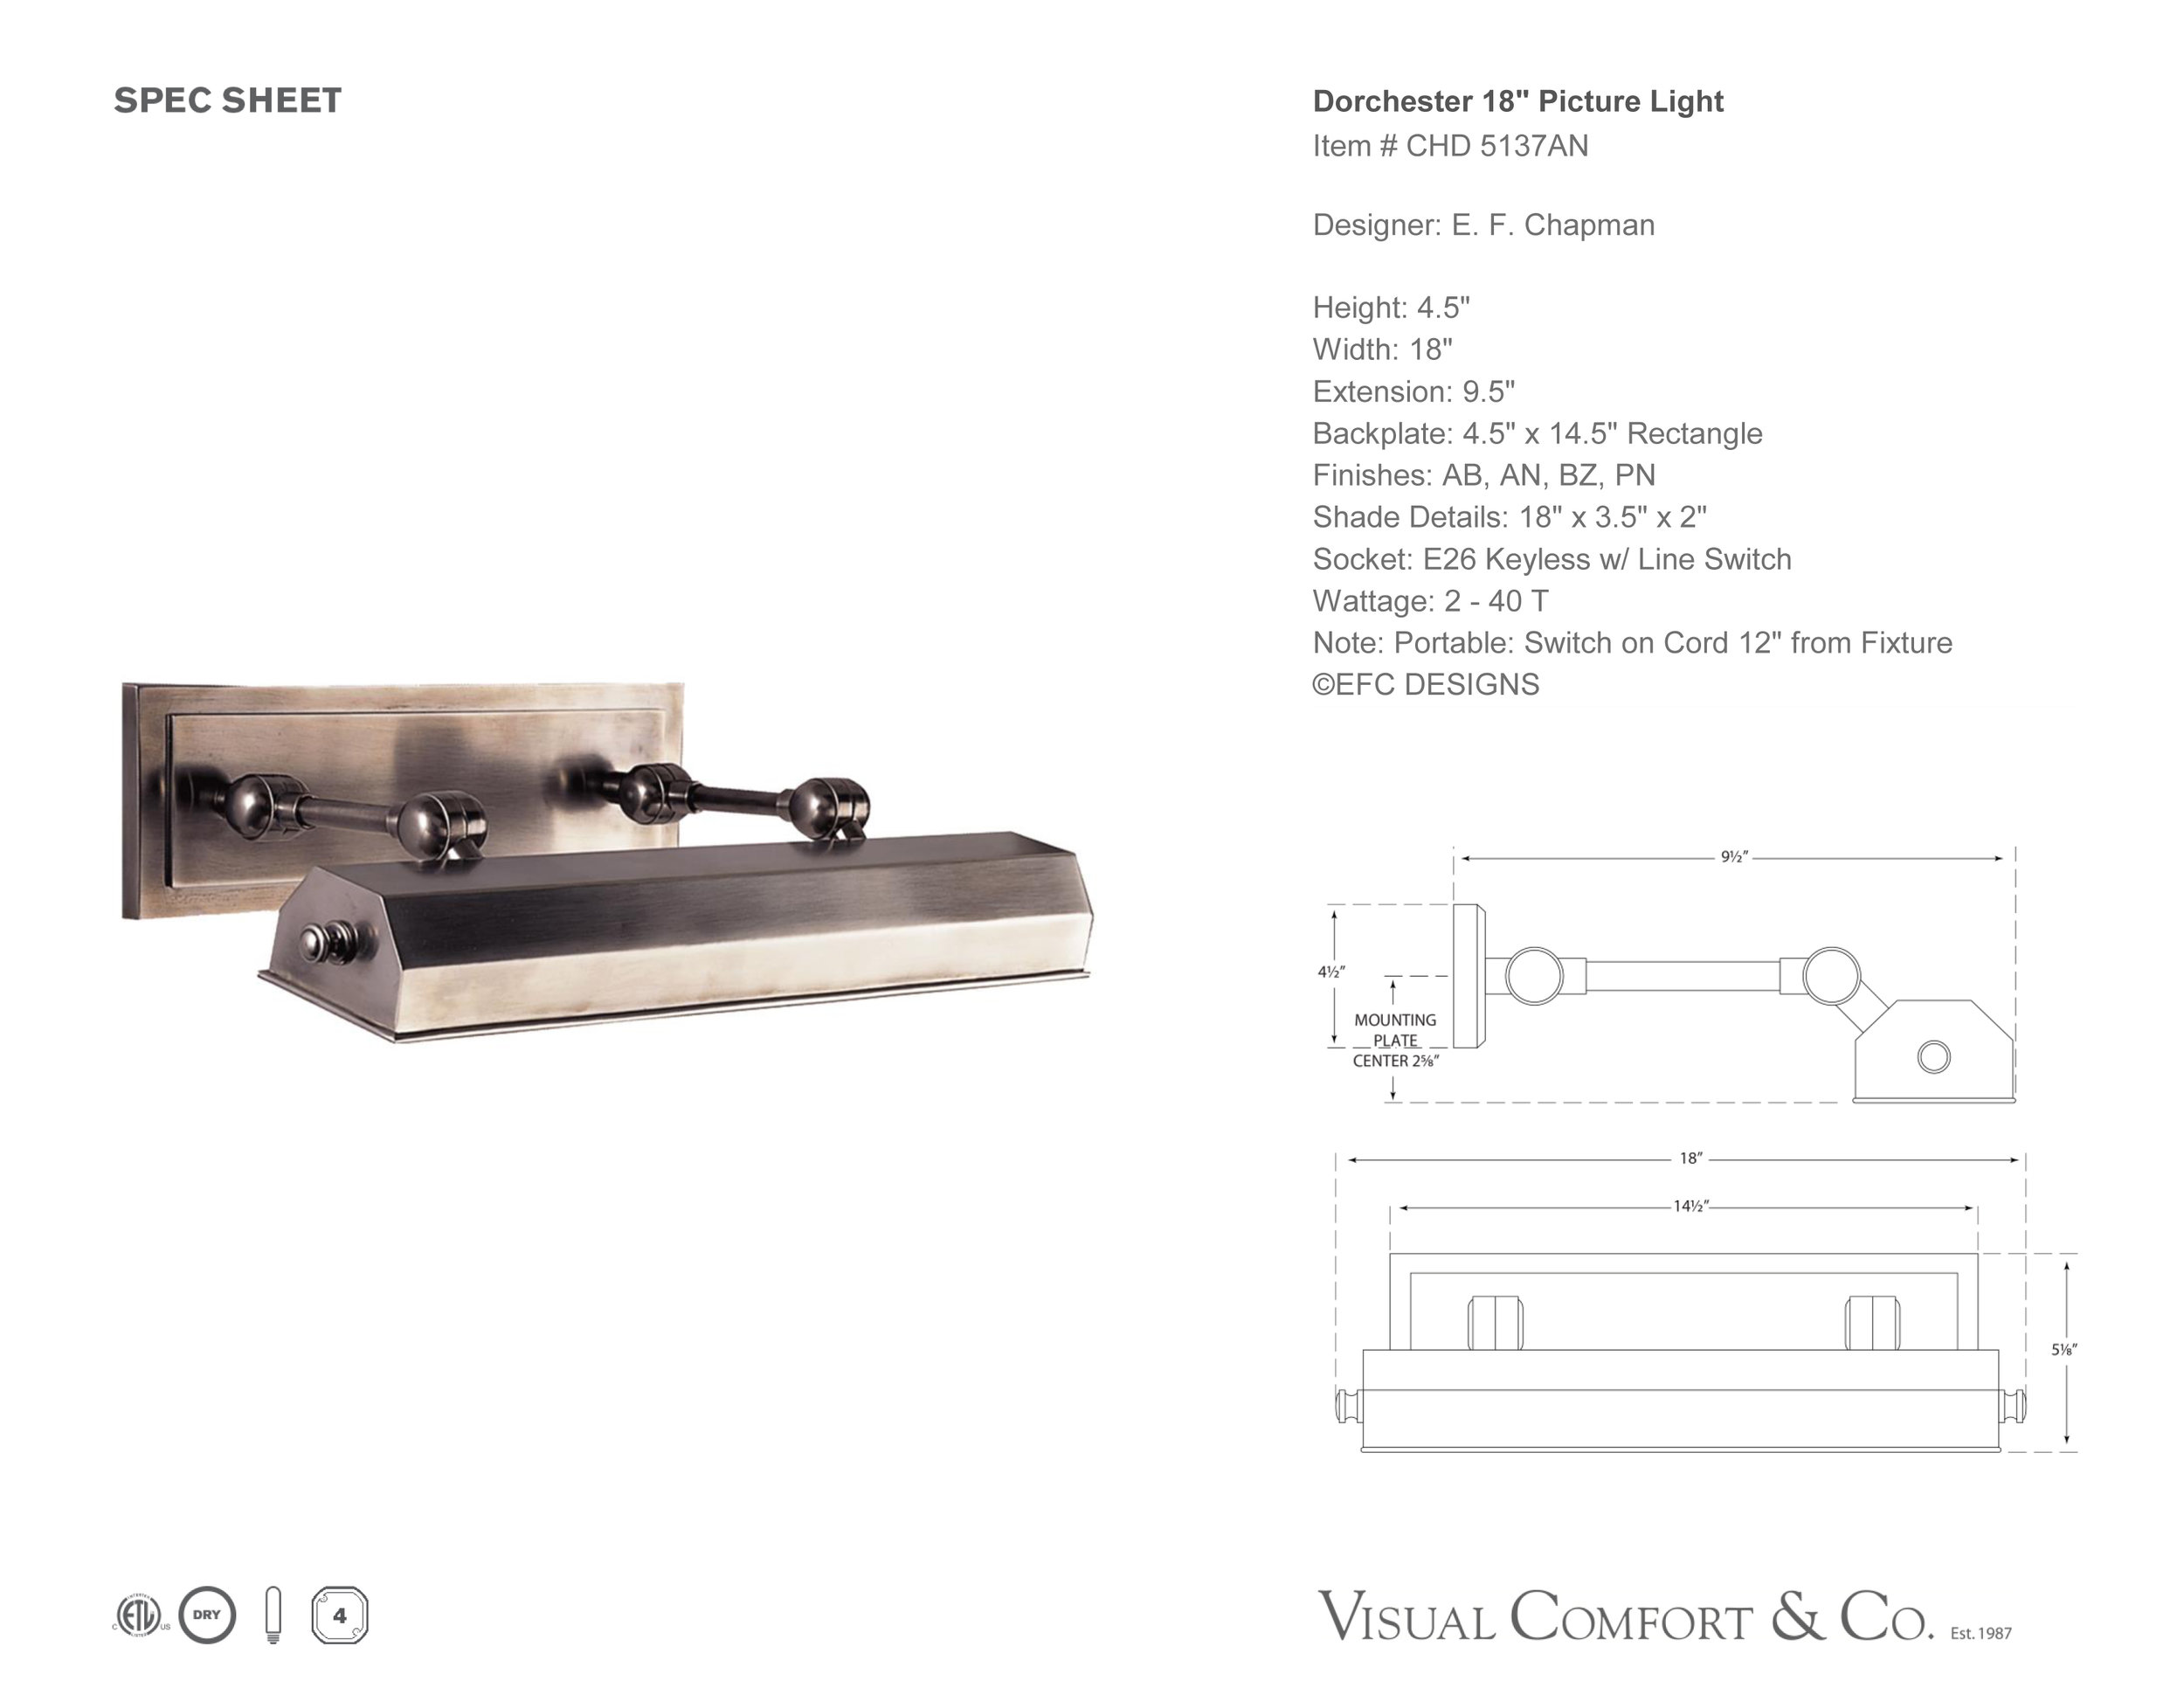 Visual Comfort Dorchester picture light spec sheet.jpg